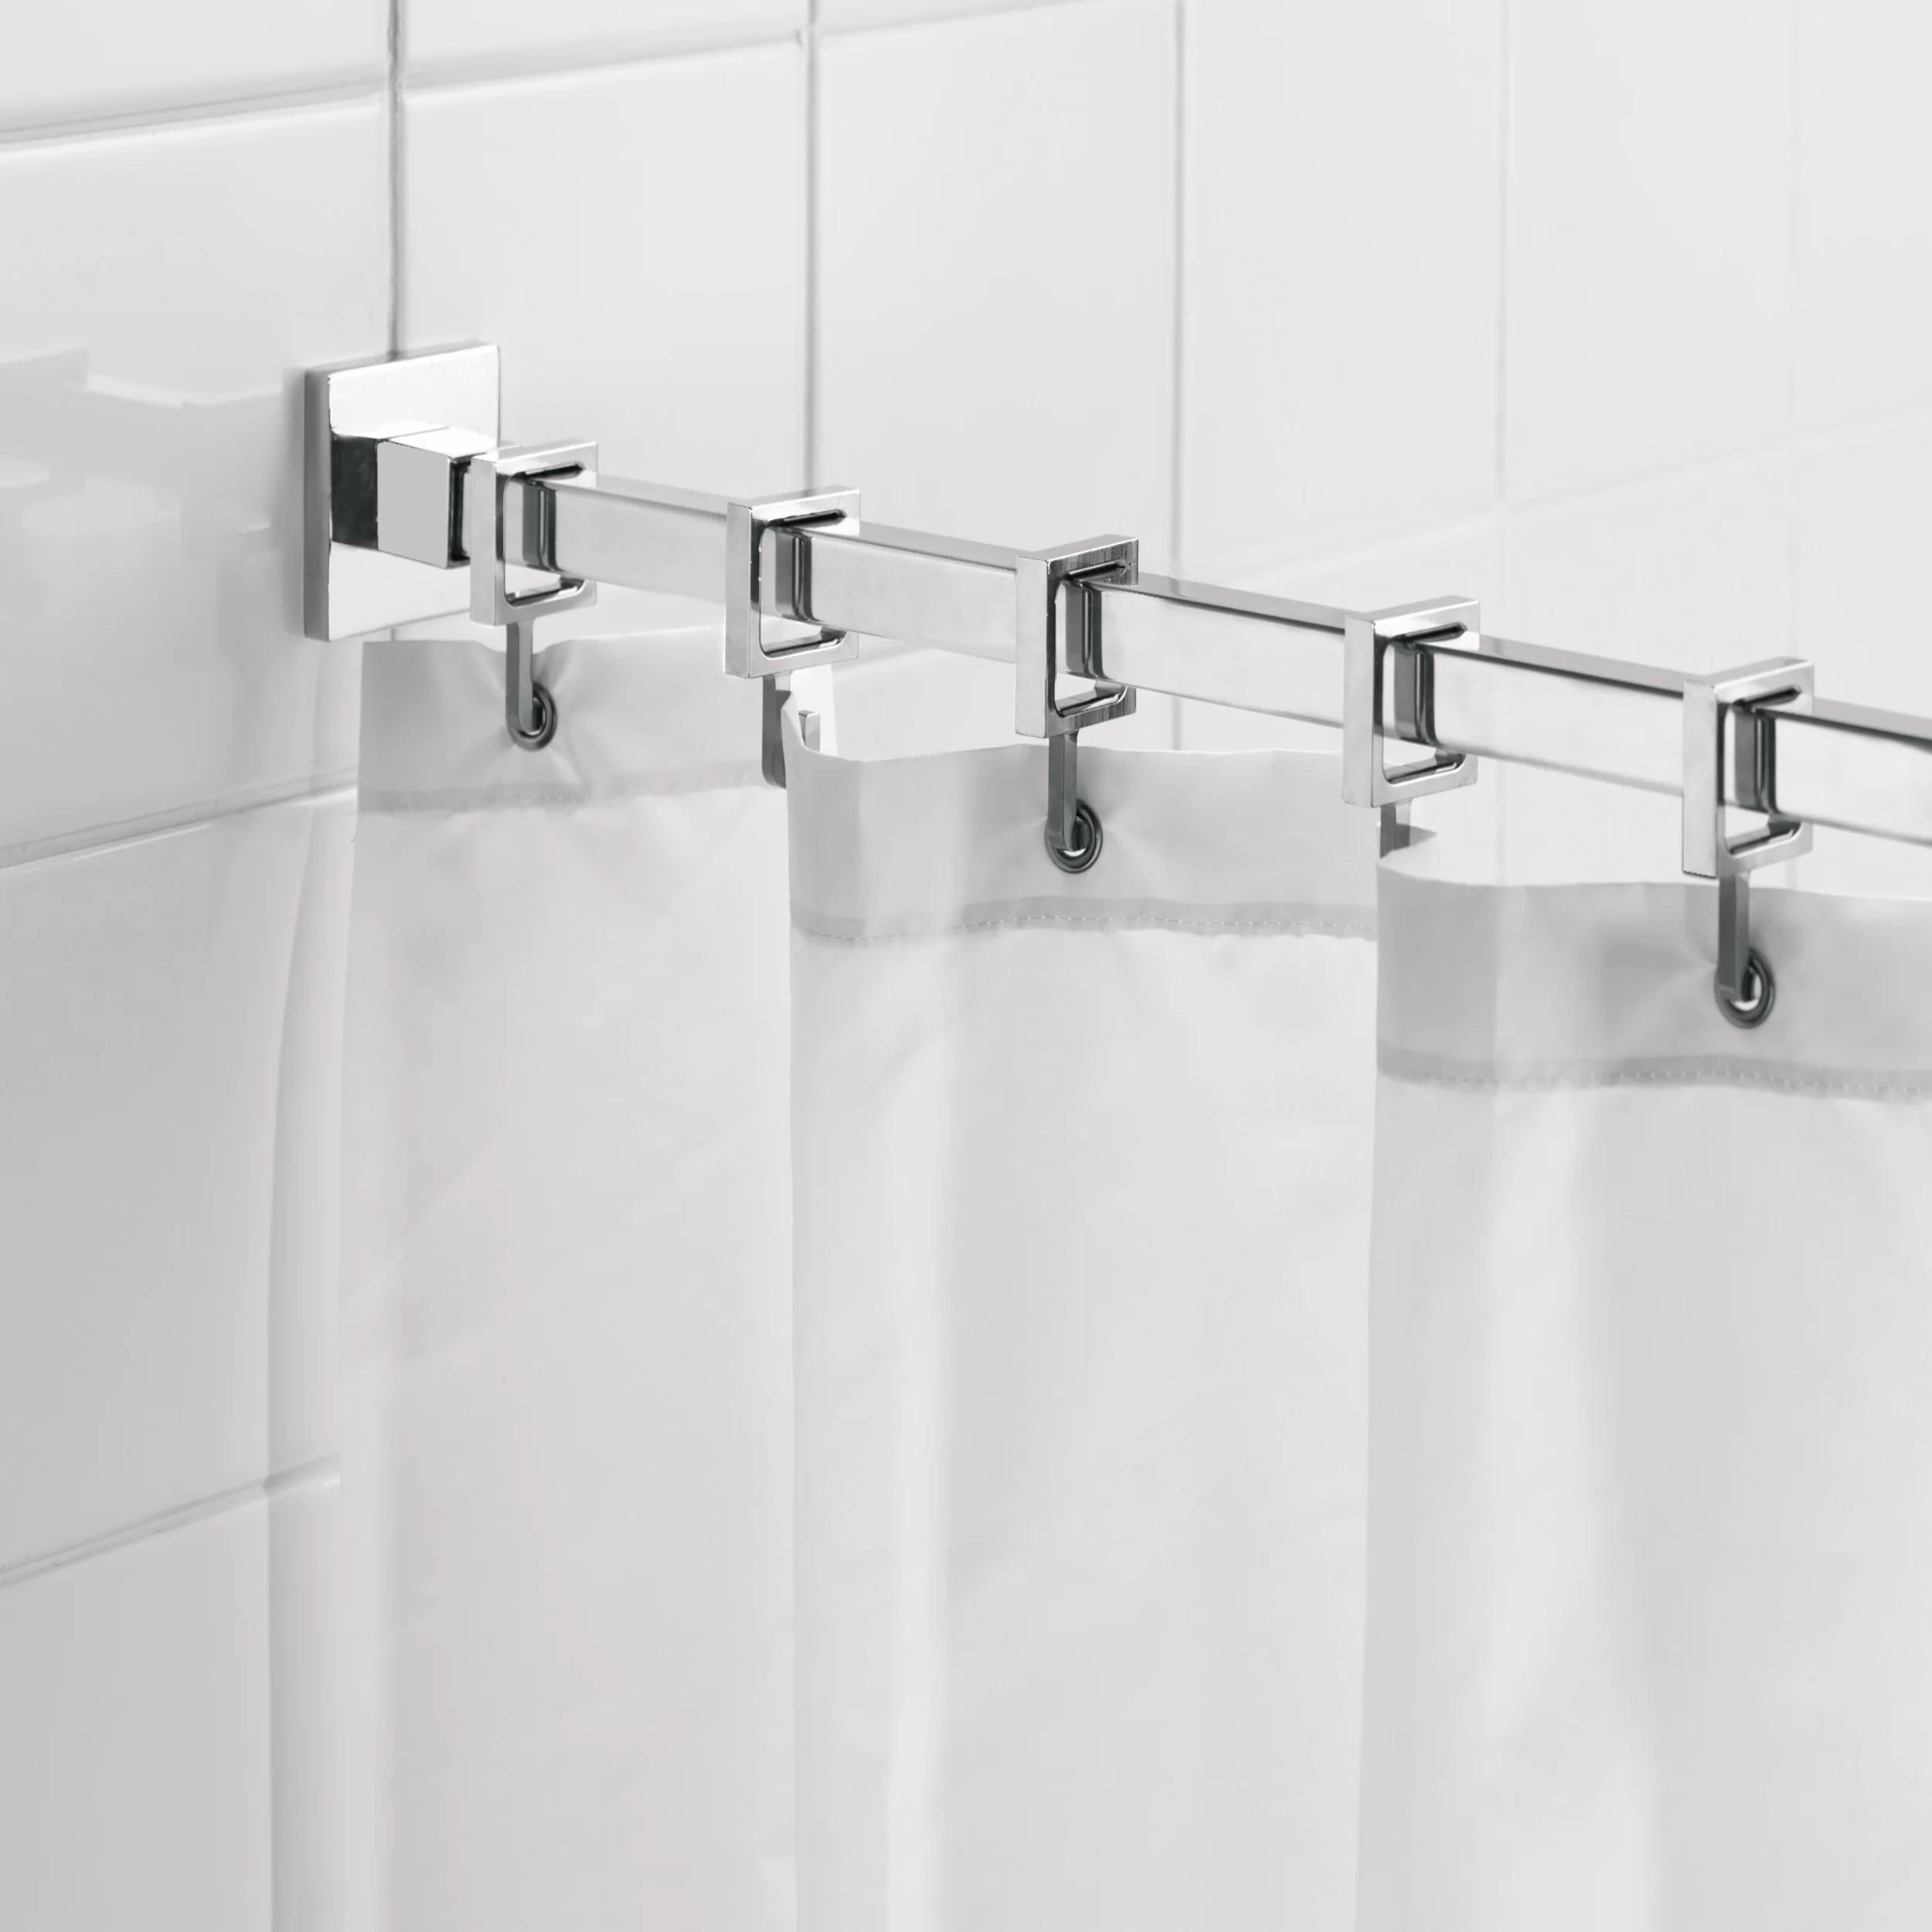 Croydex Luxury 98 25 Adjustable Straight Fixed Shower